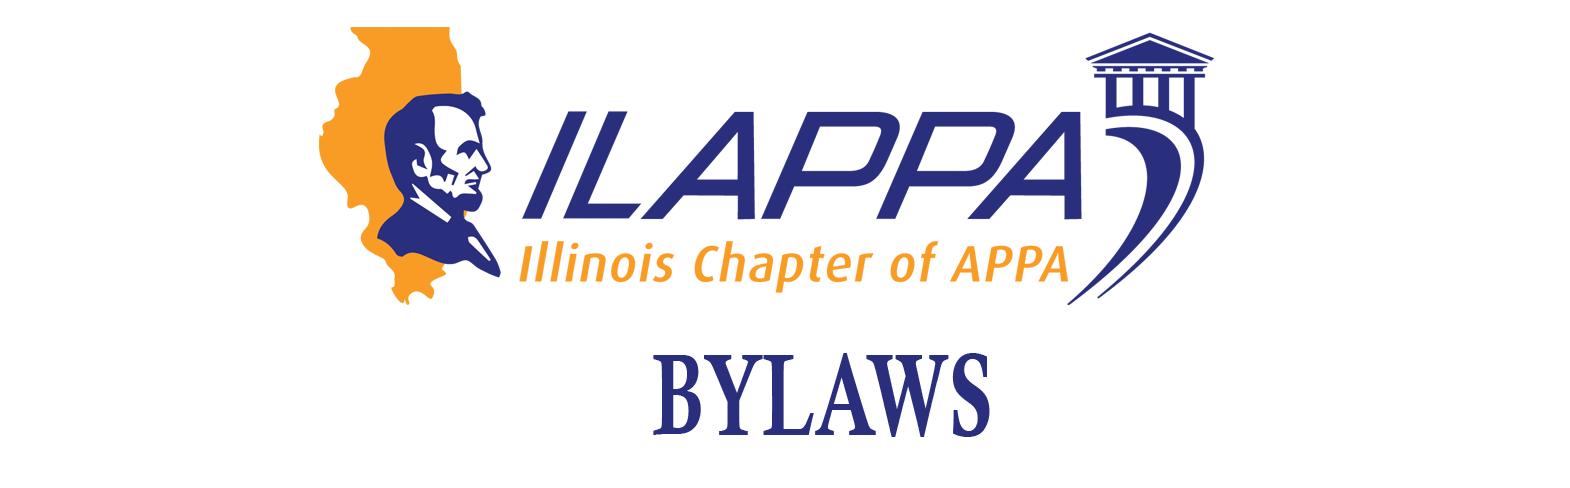 ILAPPA Bylaws